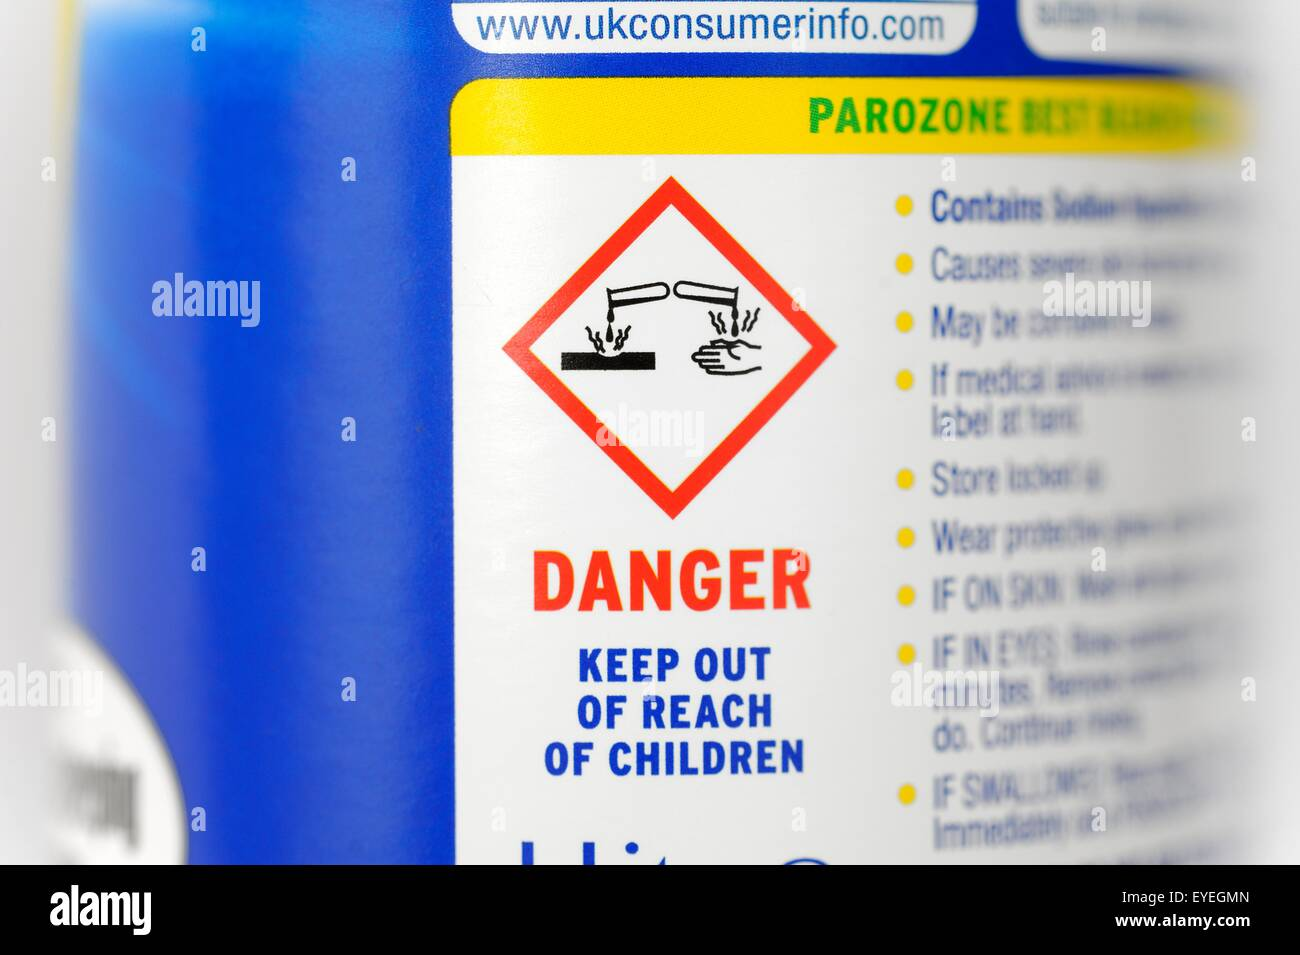 Bleach bottle warning stock photos bleach bottle warning stock caustic warning symbol on a bottle of bleach stock image biocorpaavc